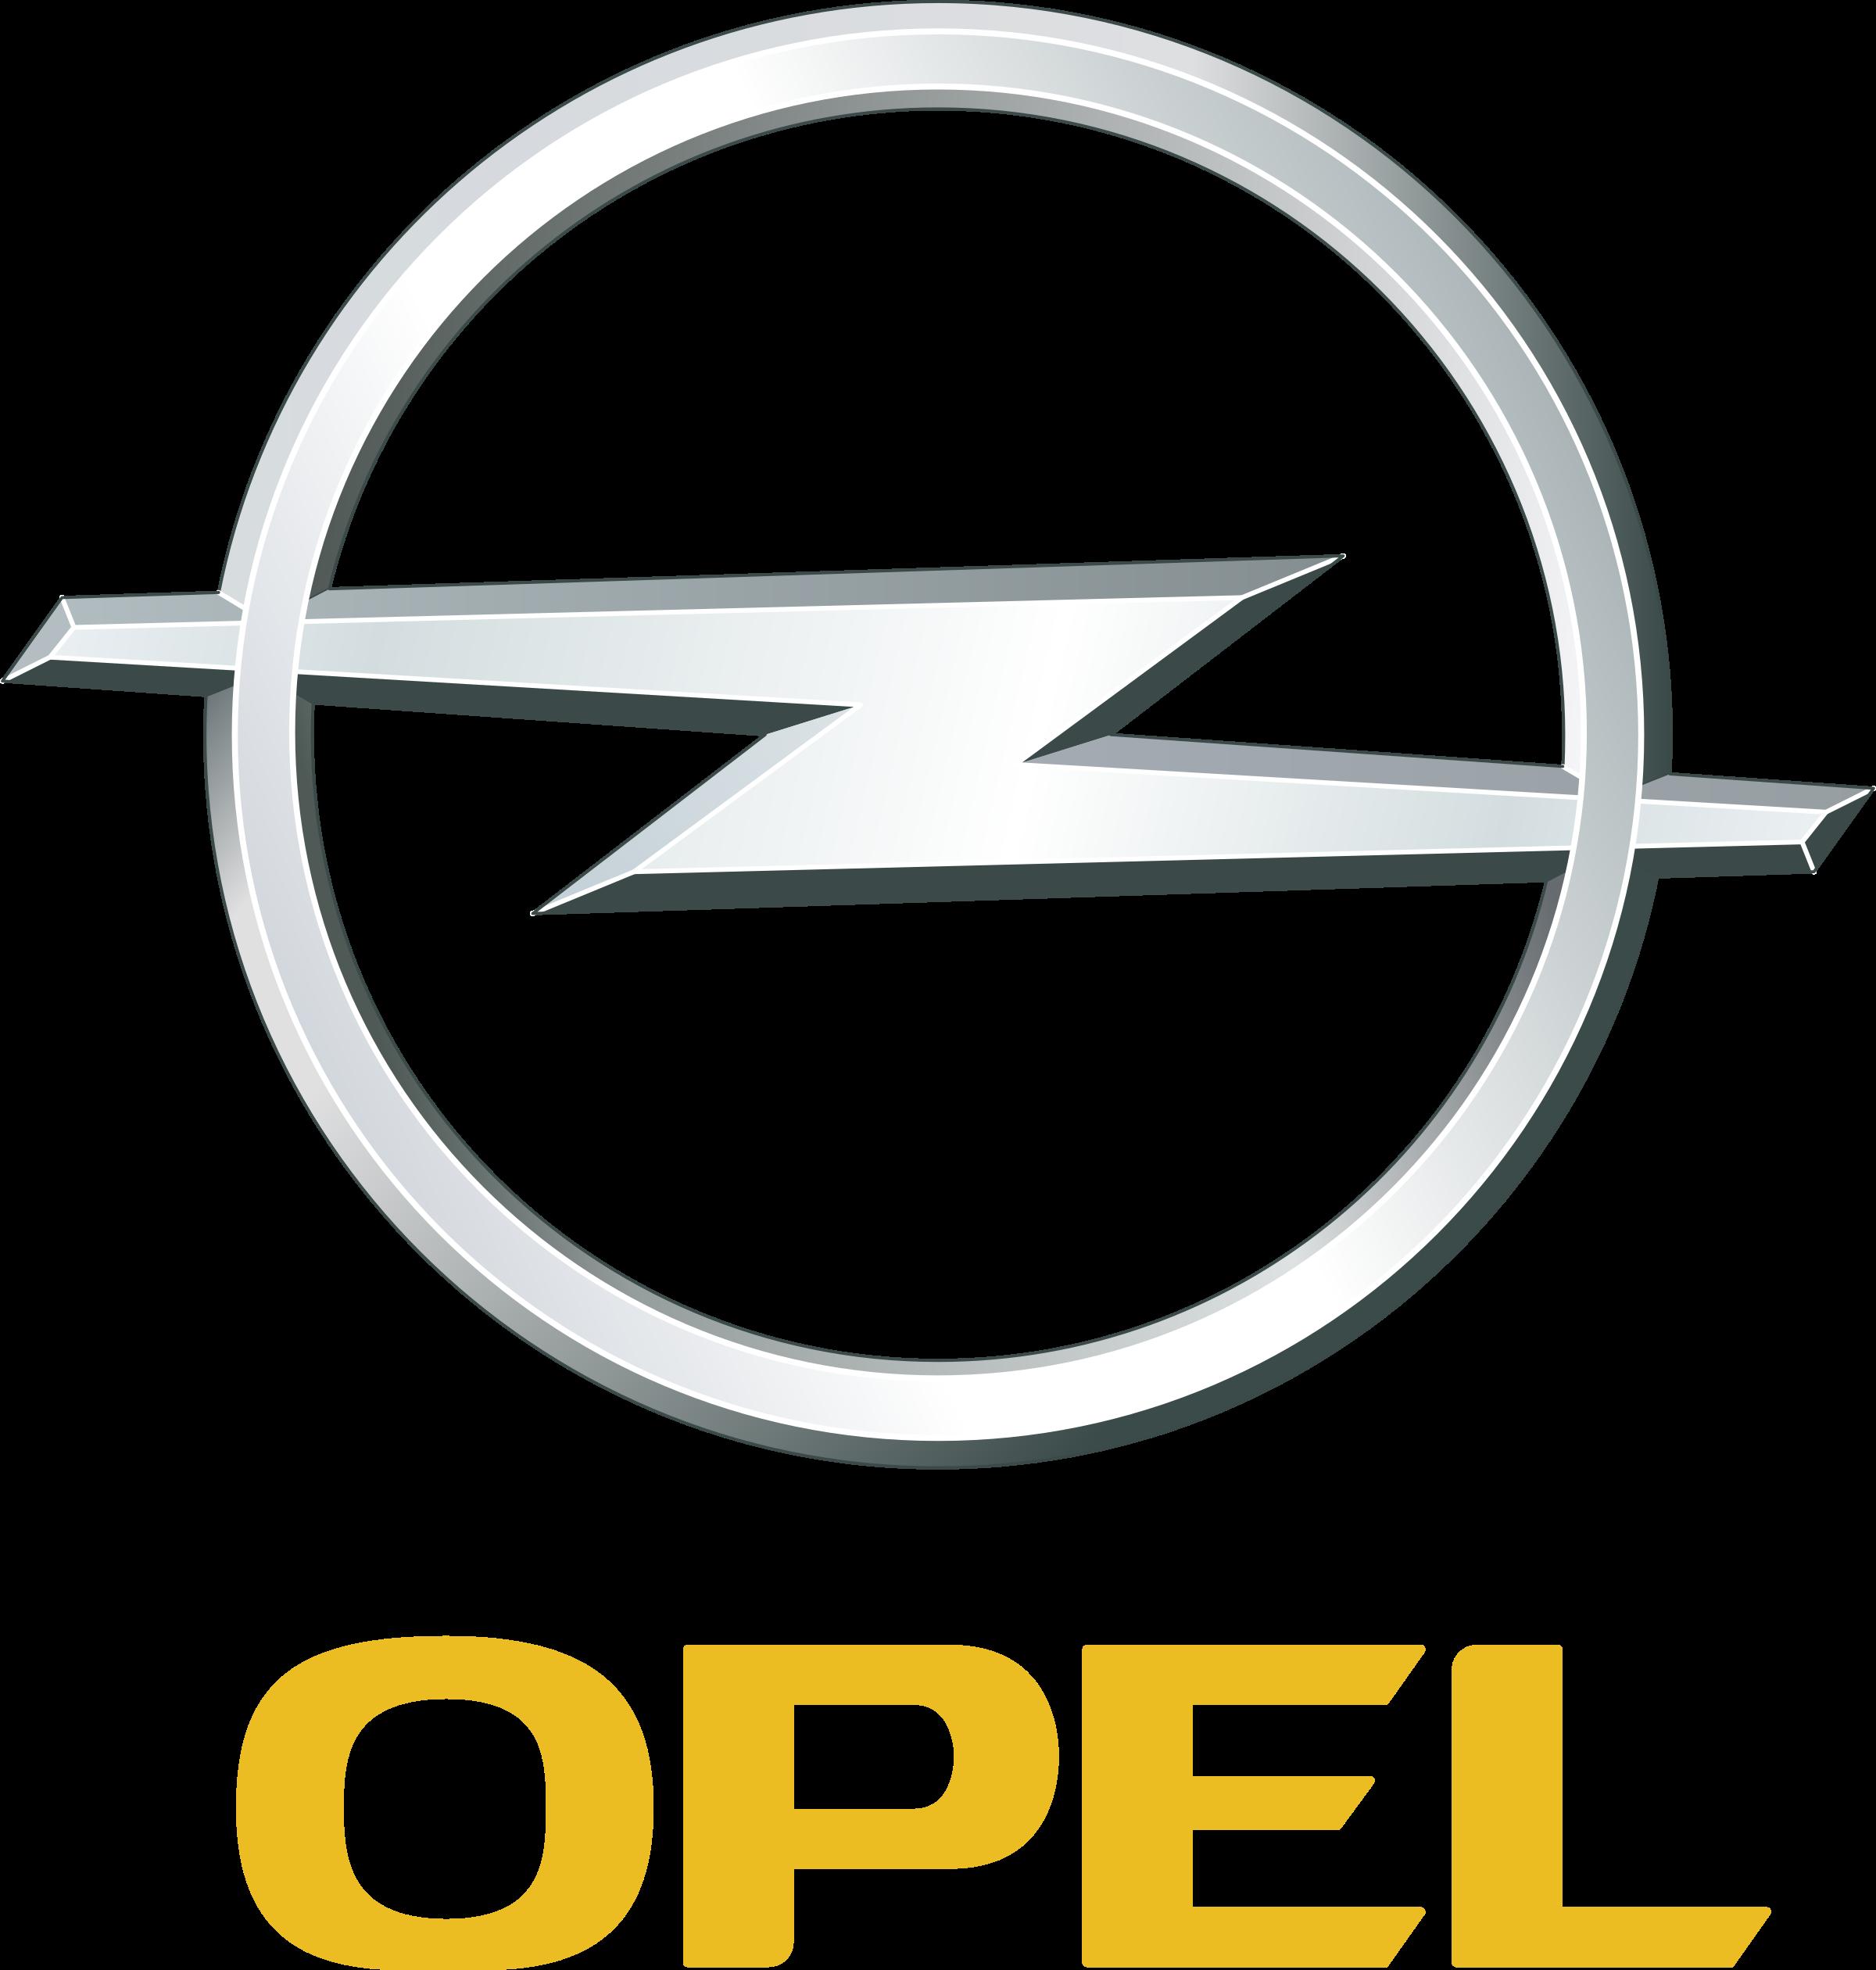 Opencart Logo Svg